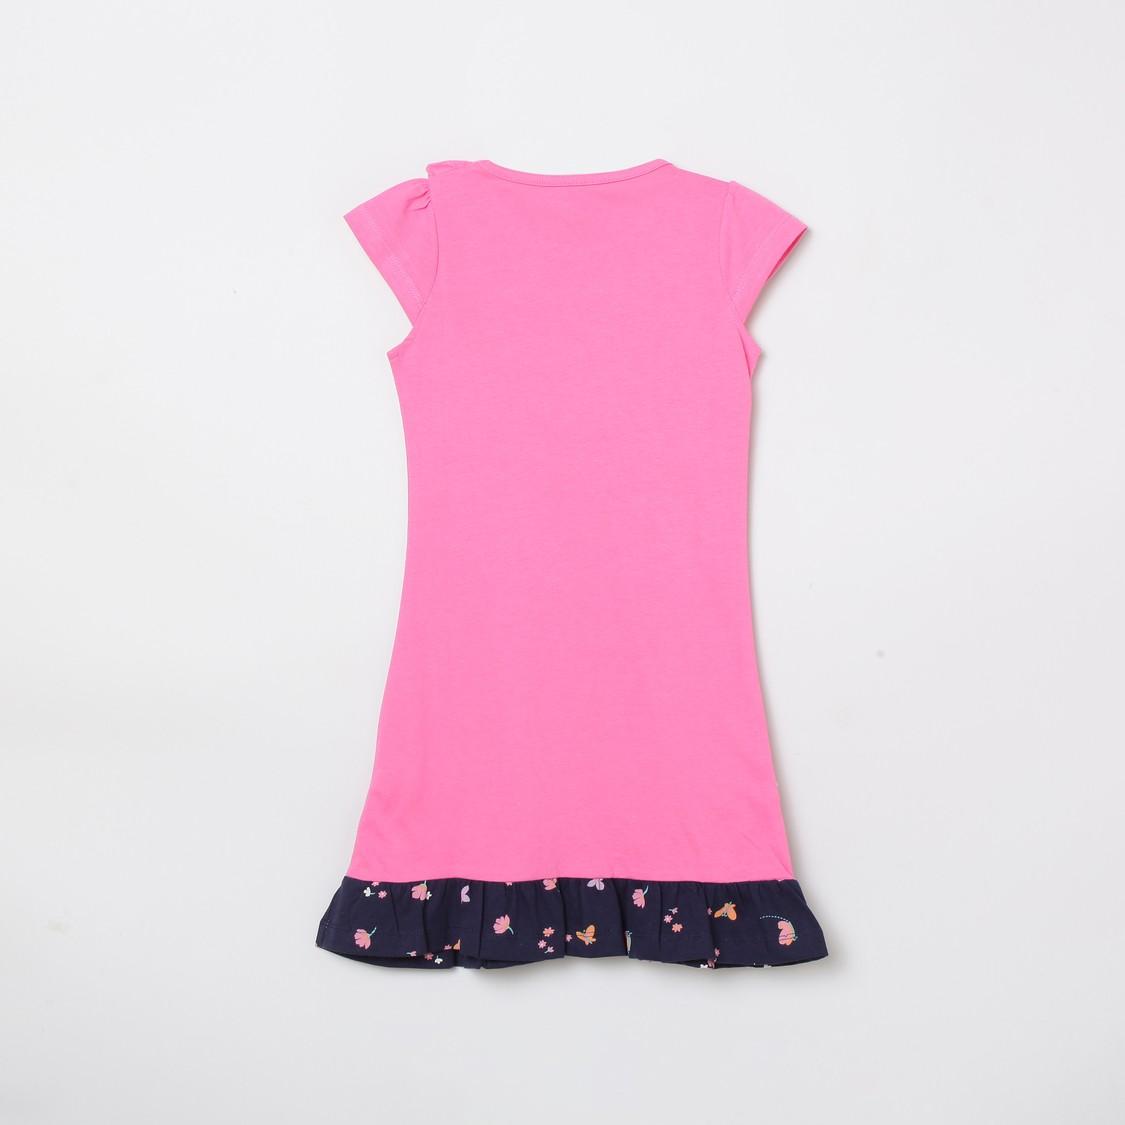 MAX Printed Sleepwear Dress with Ruffle Detail